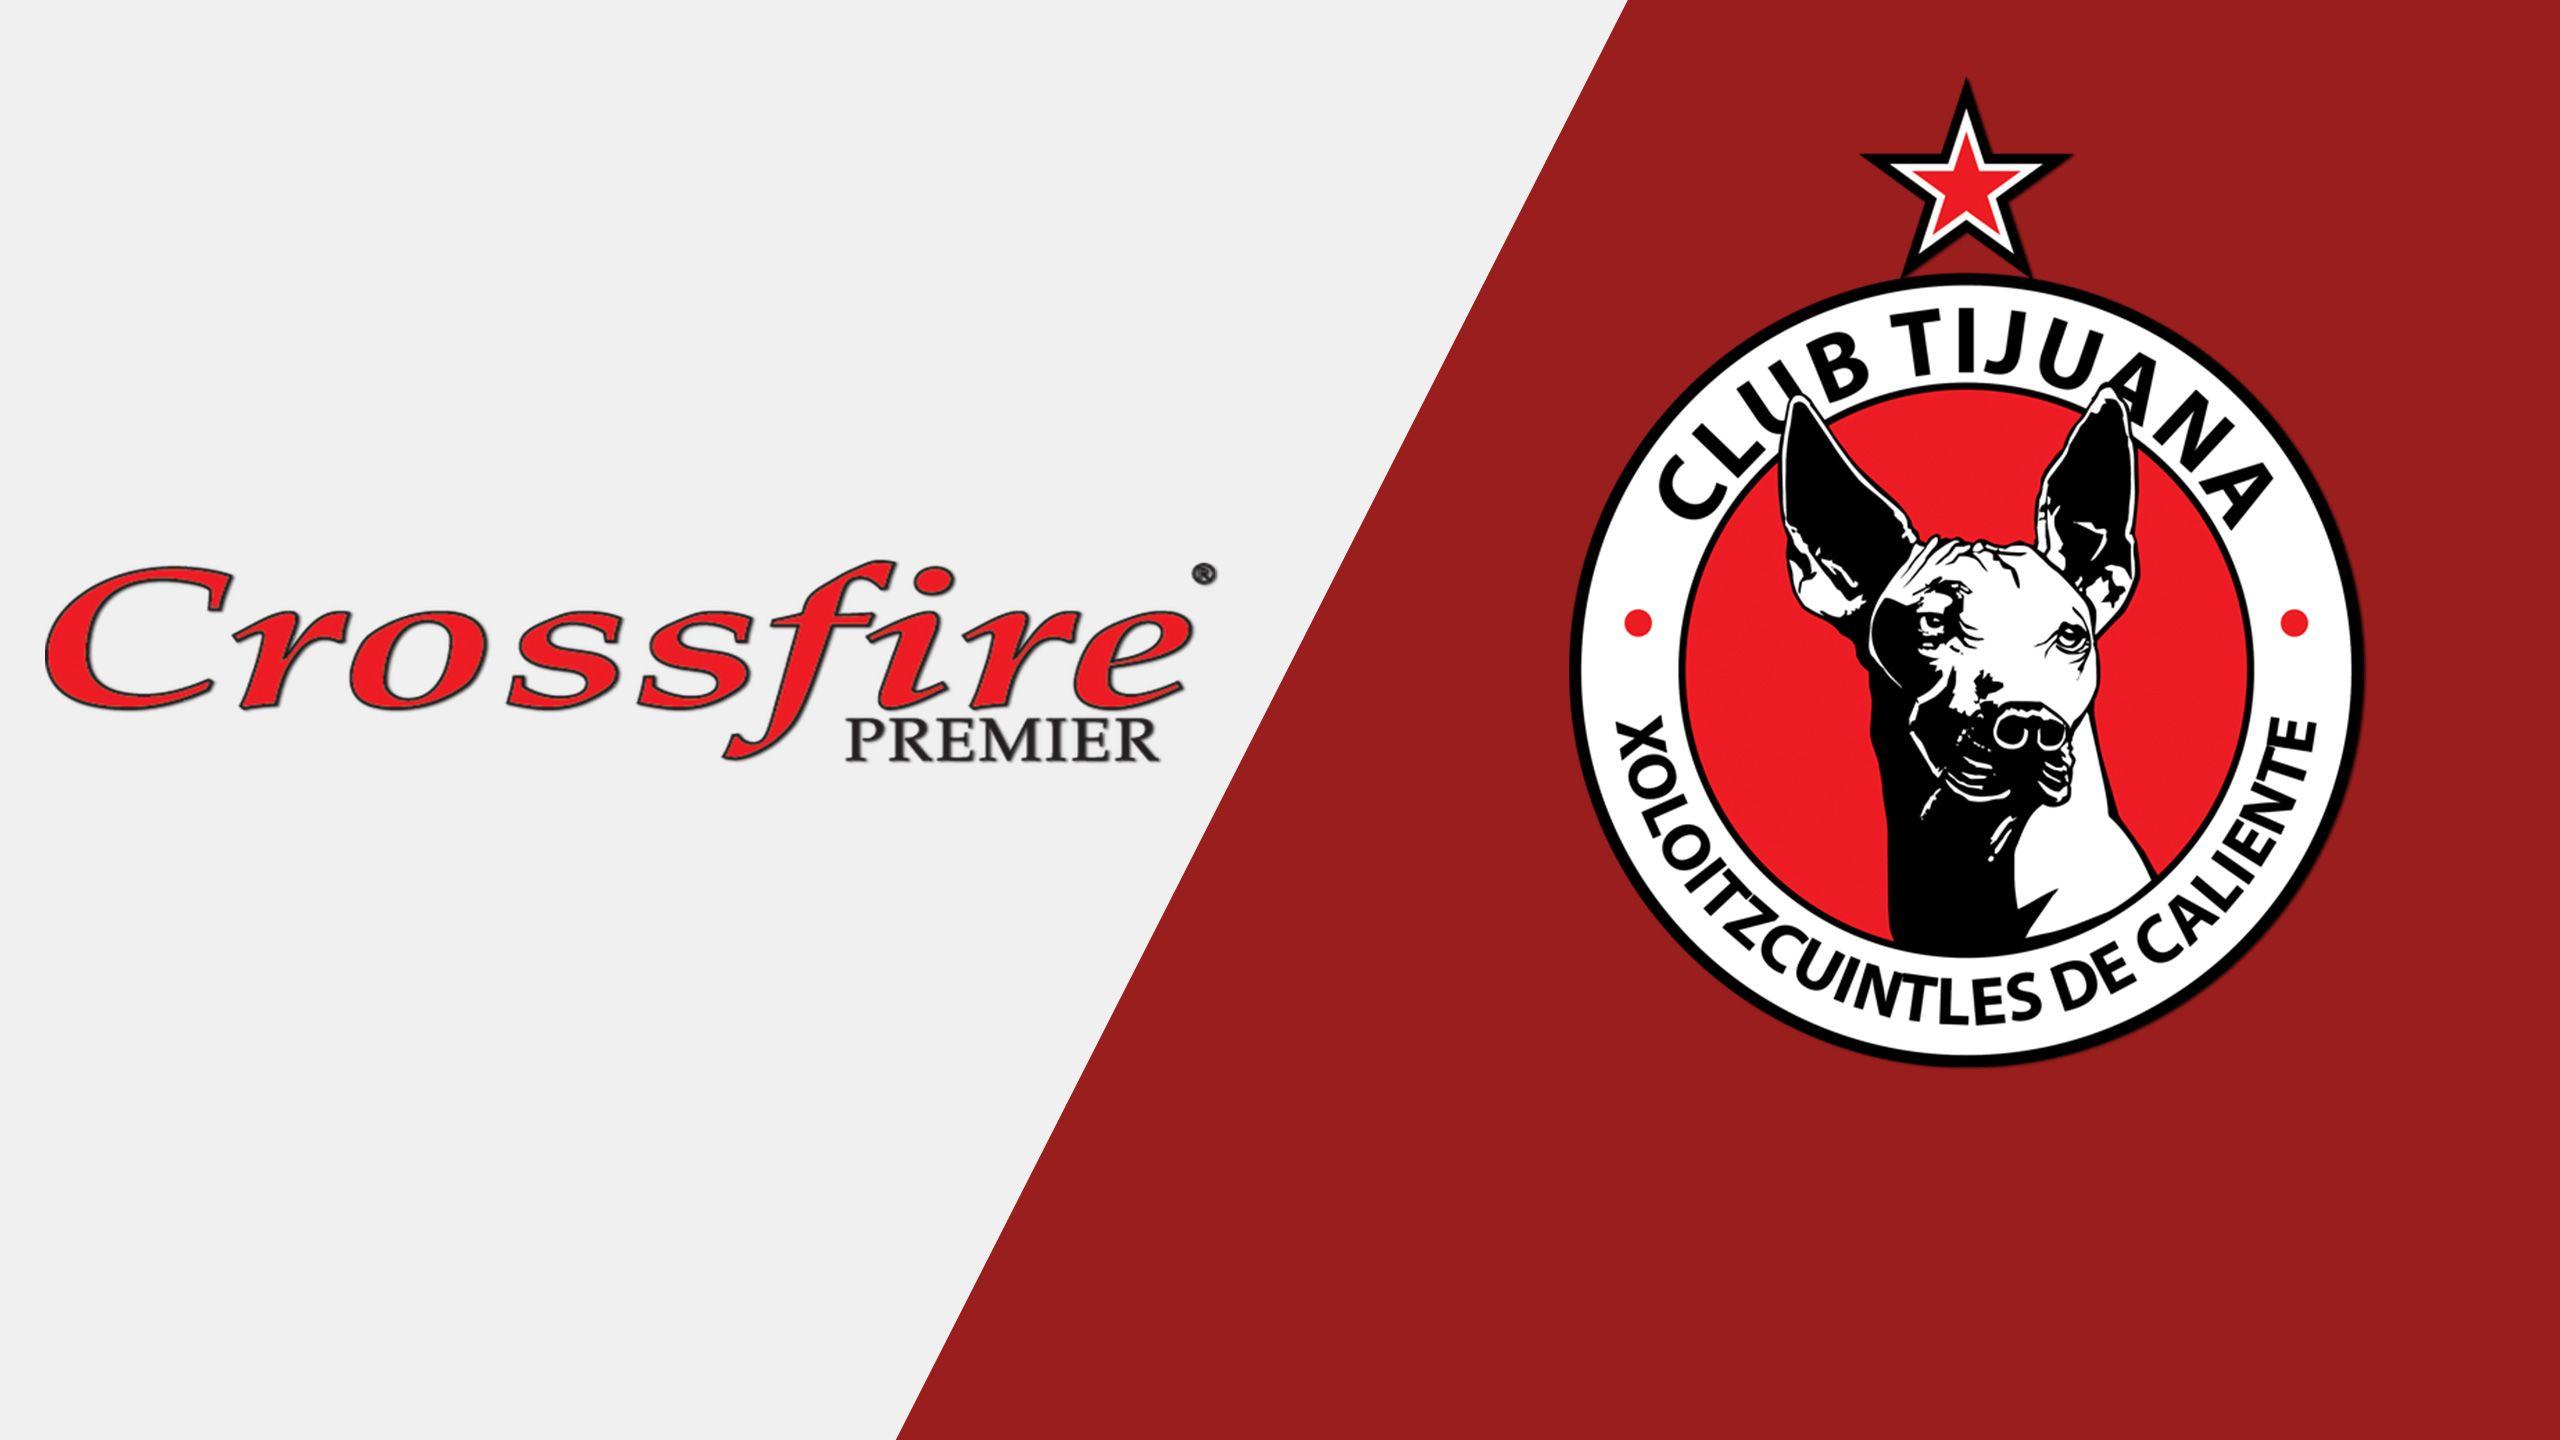 Crossfire Premier Under-14 vs. Xolos de Tijuana Under-14 (3rd Place Game) (Manchester City Cup)